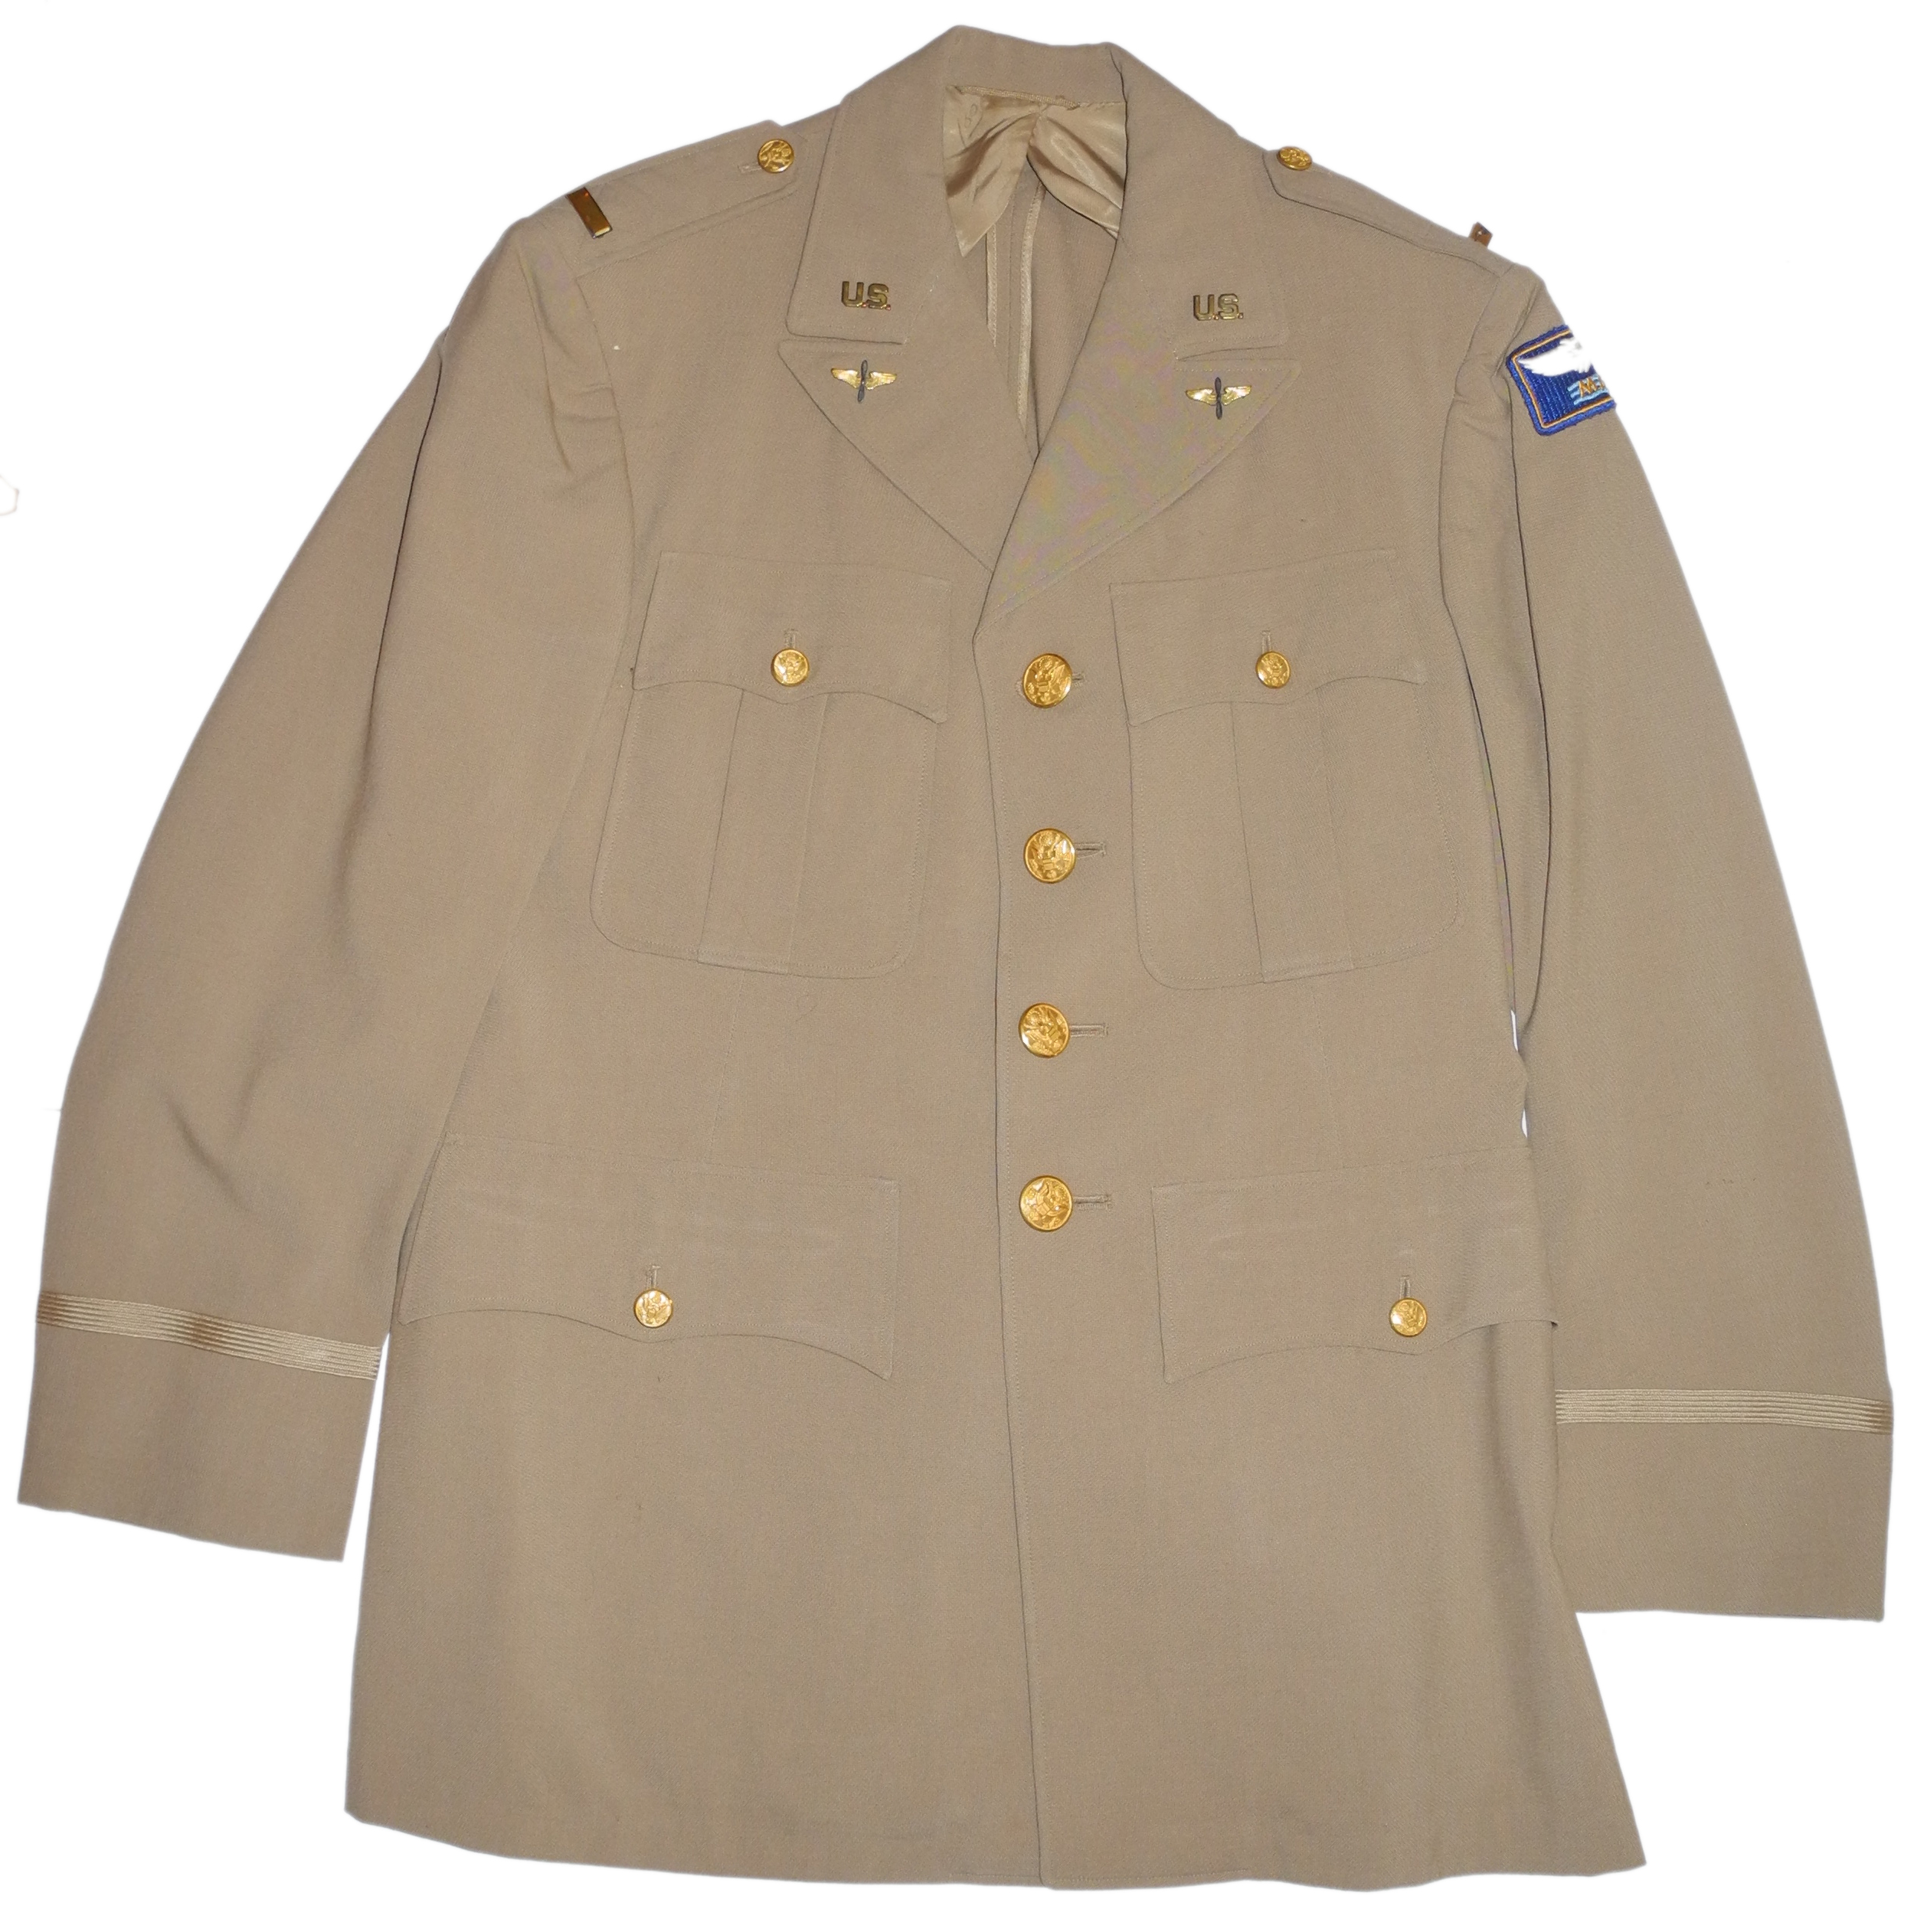 WWII AAF Lt. khaki service uniform MAAF